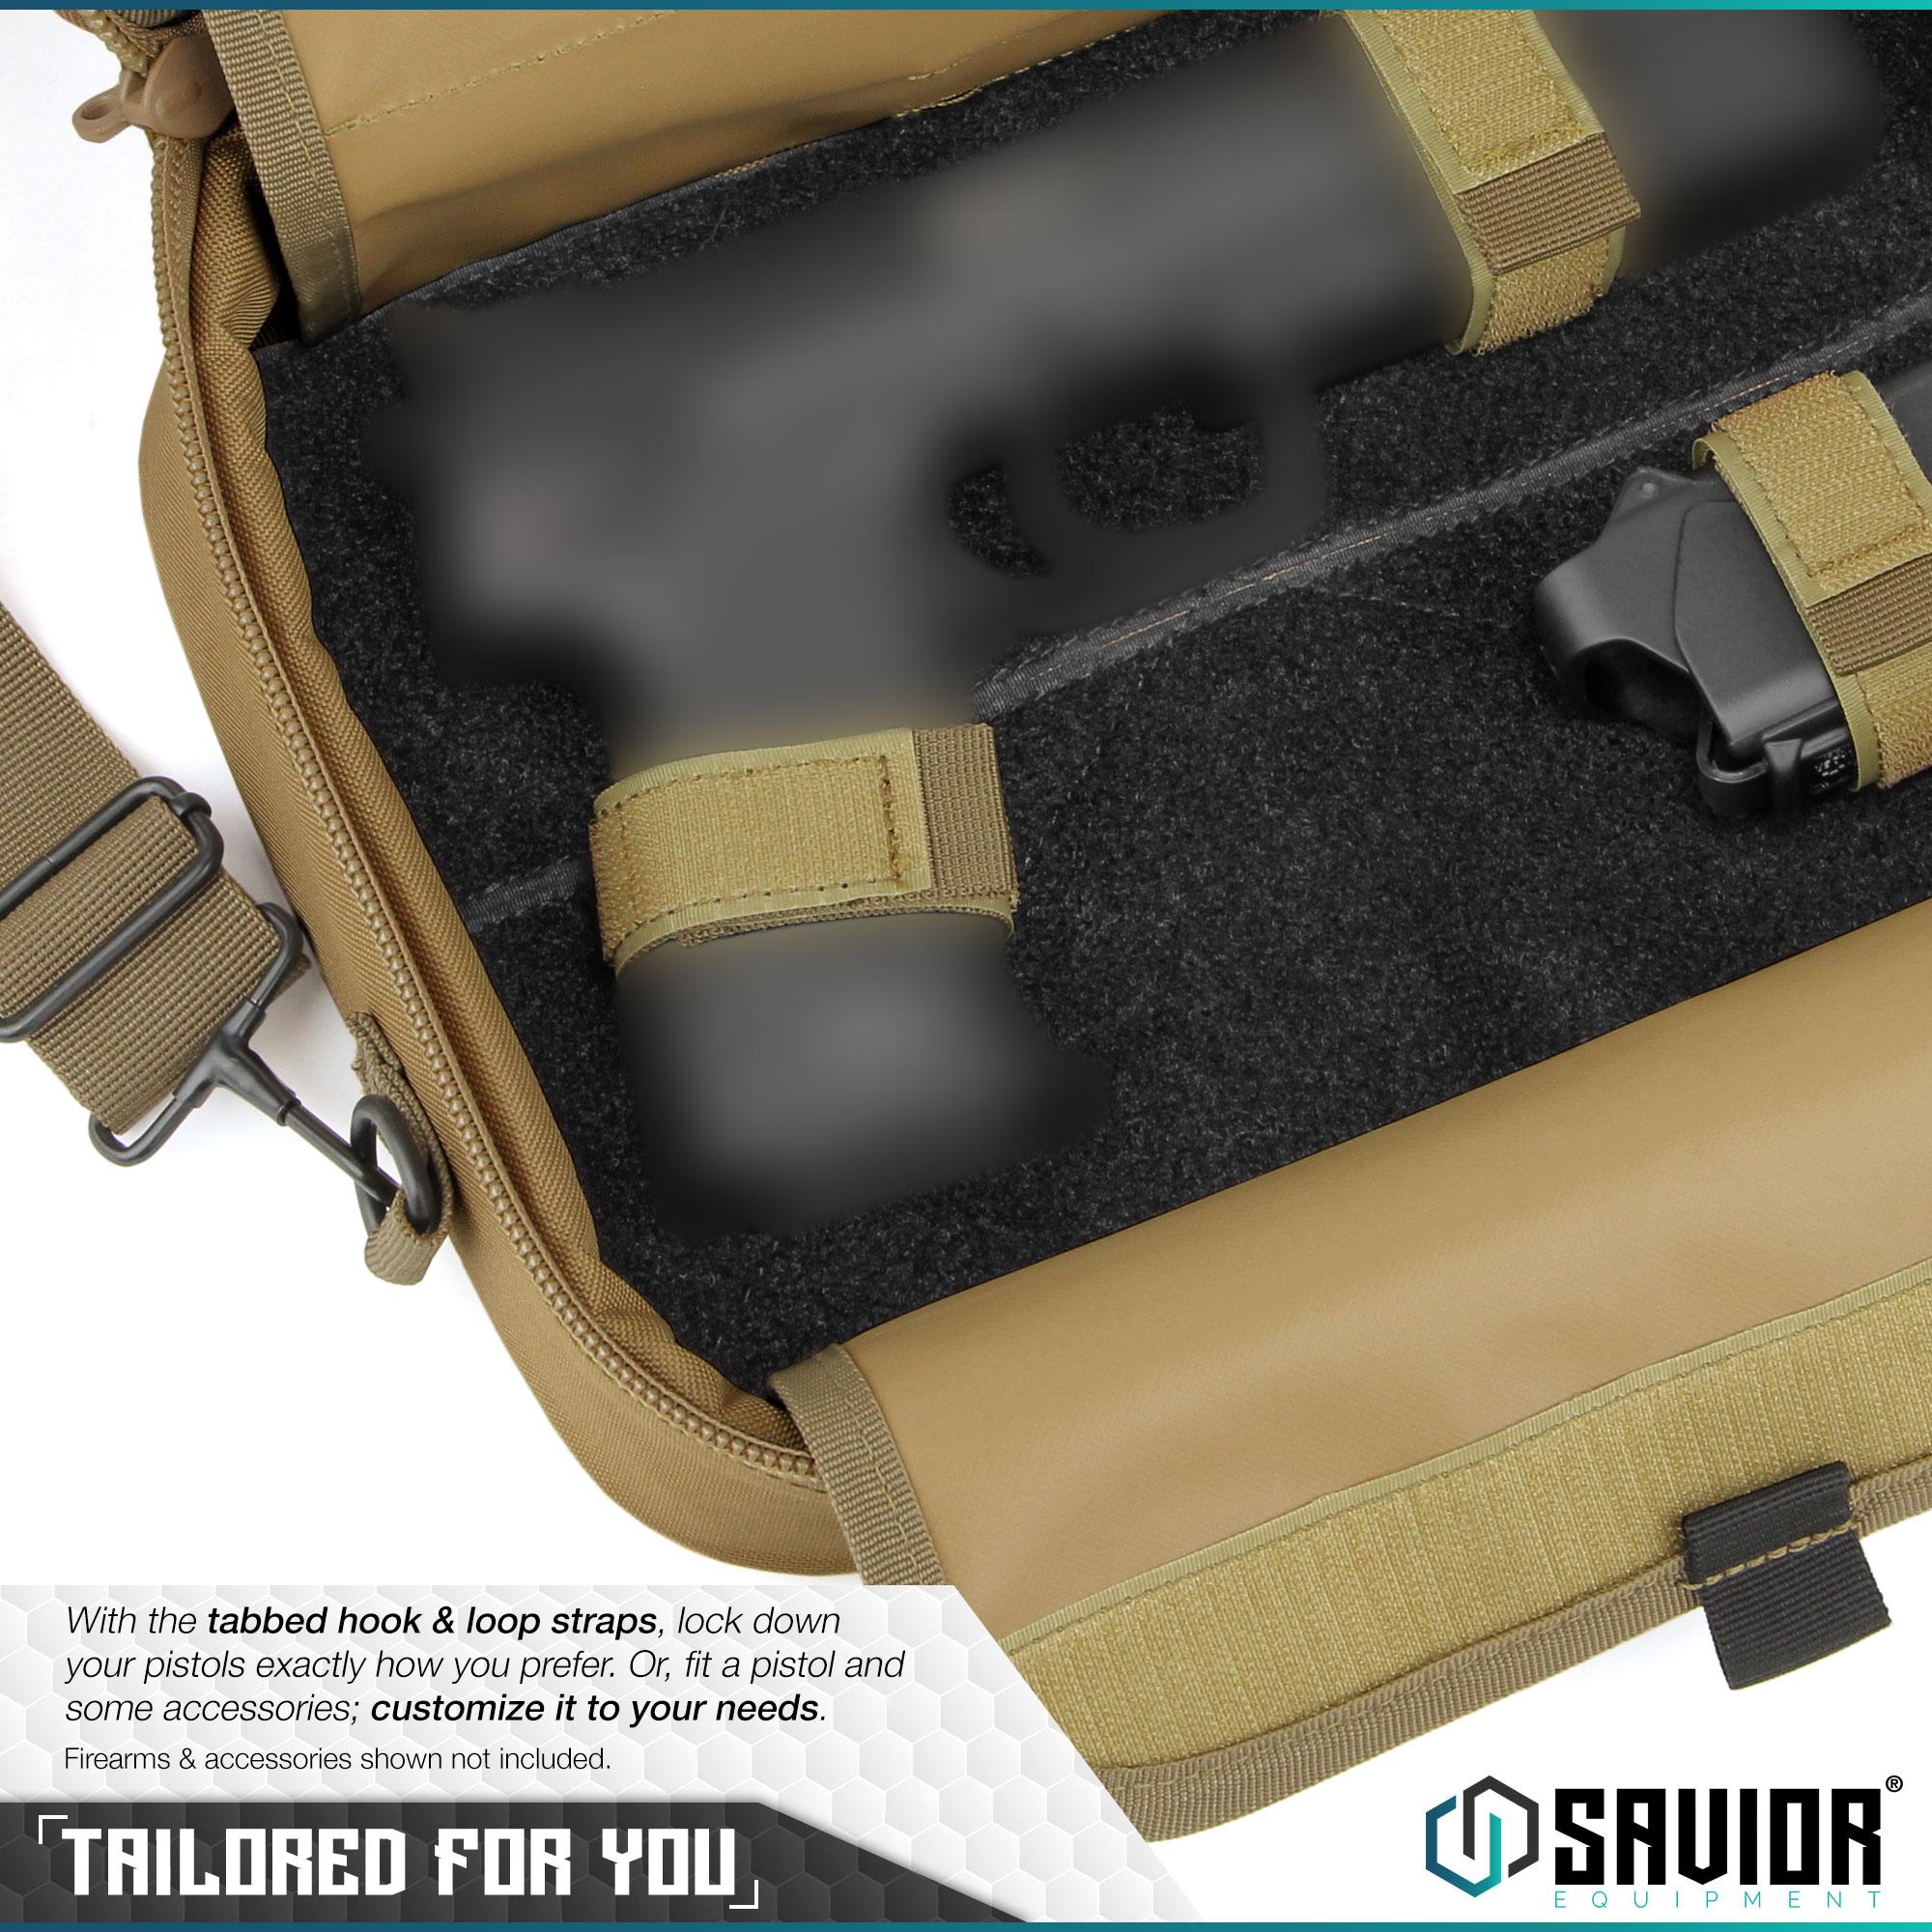 034-SAVIOR-034-Padded-Discreet-Double-Handgun-Bag-Pistol-Storage-Case-w-Mag-Pouch-Slot thumbnail 10